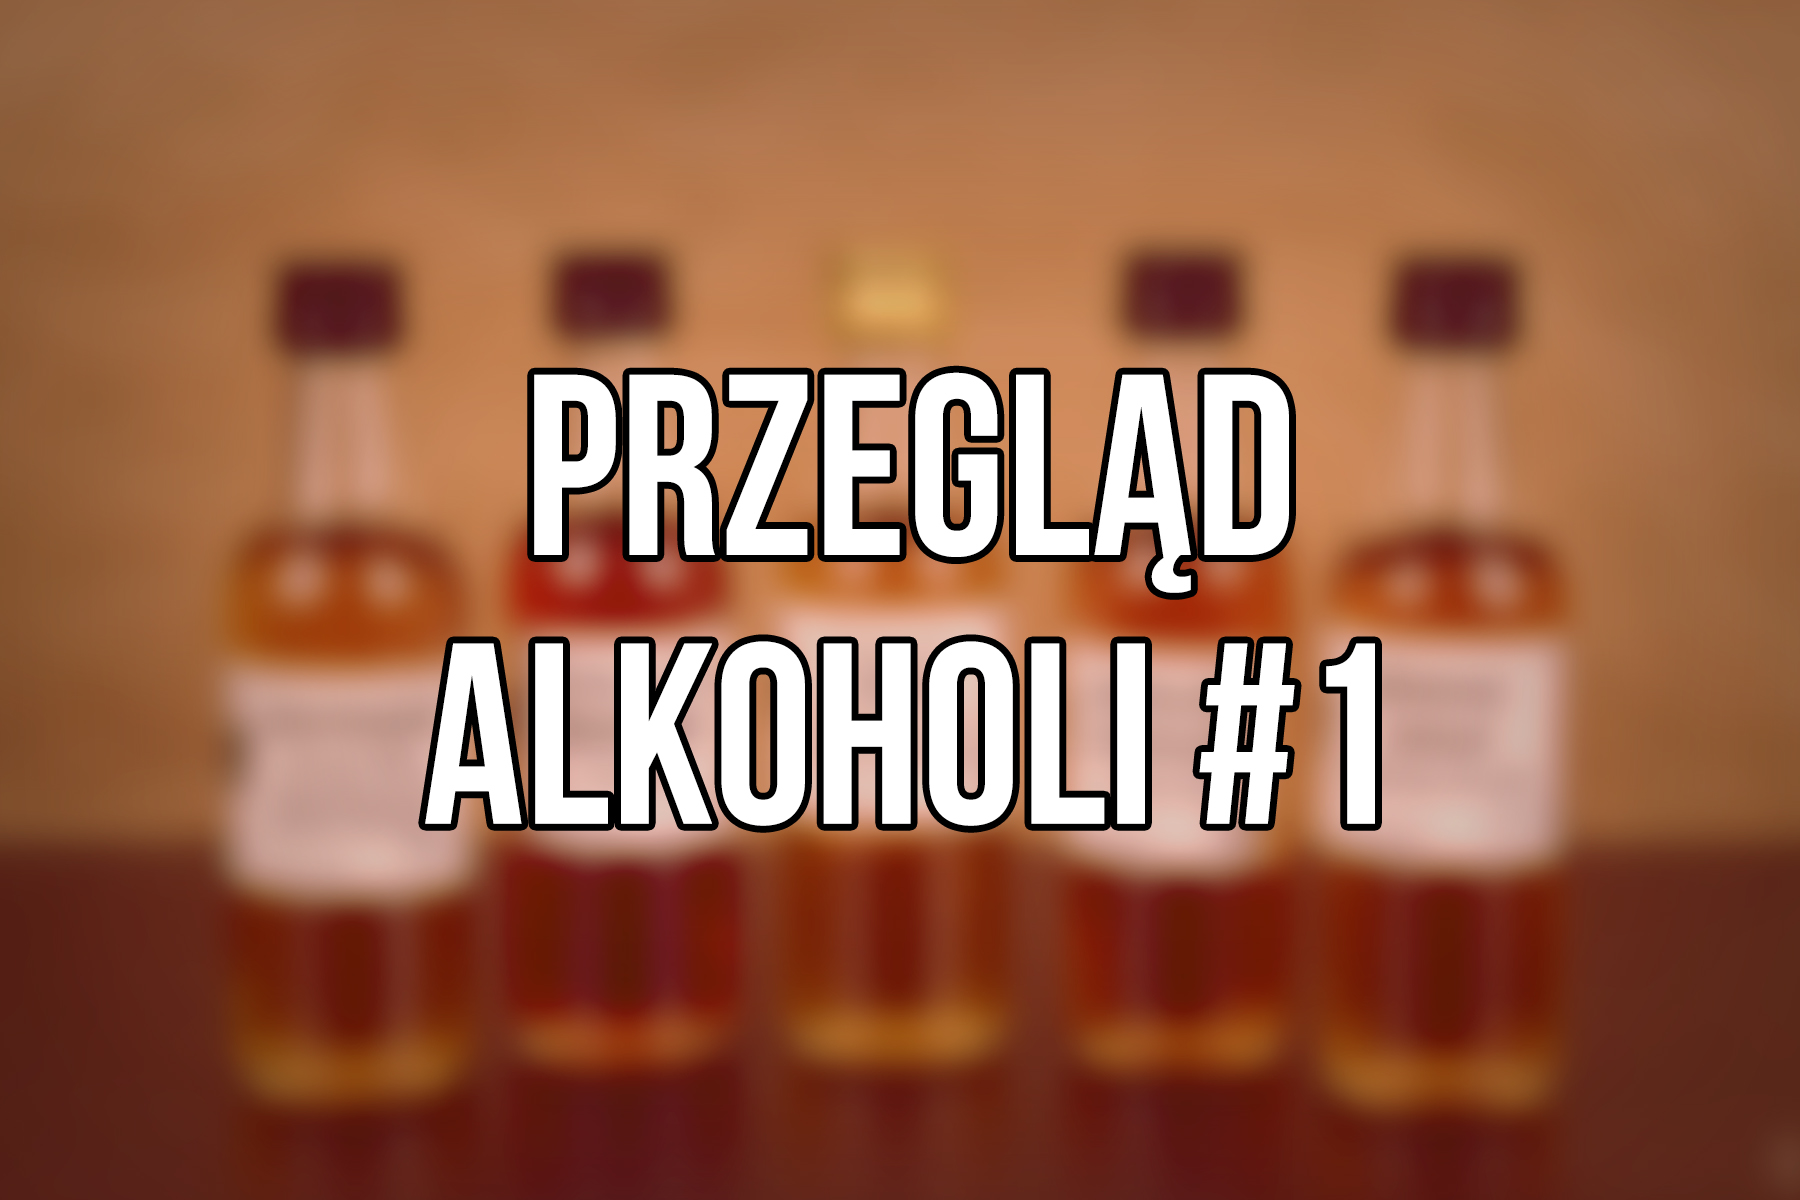 Przeglad alkoholi